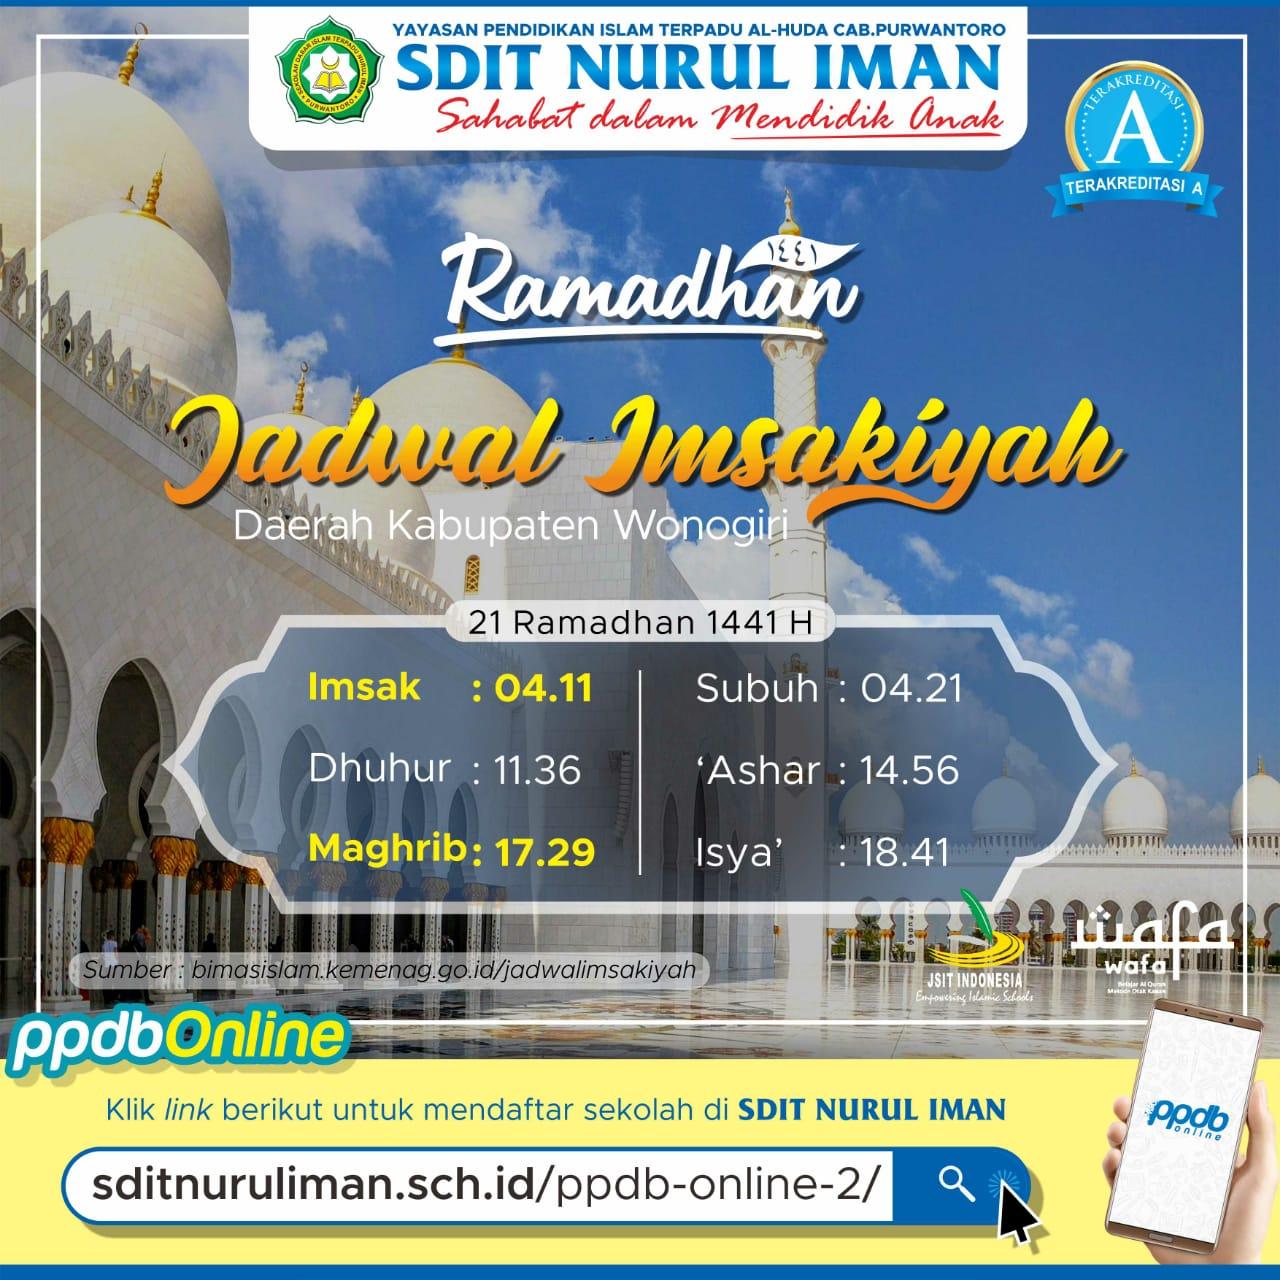 21 Ramadhan 1441 H